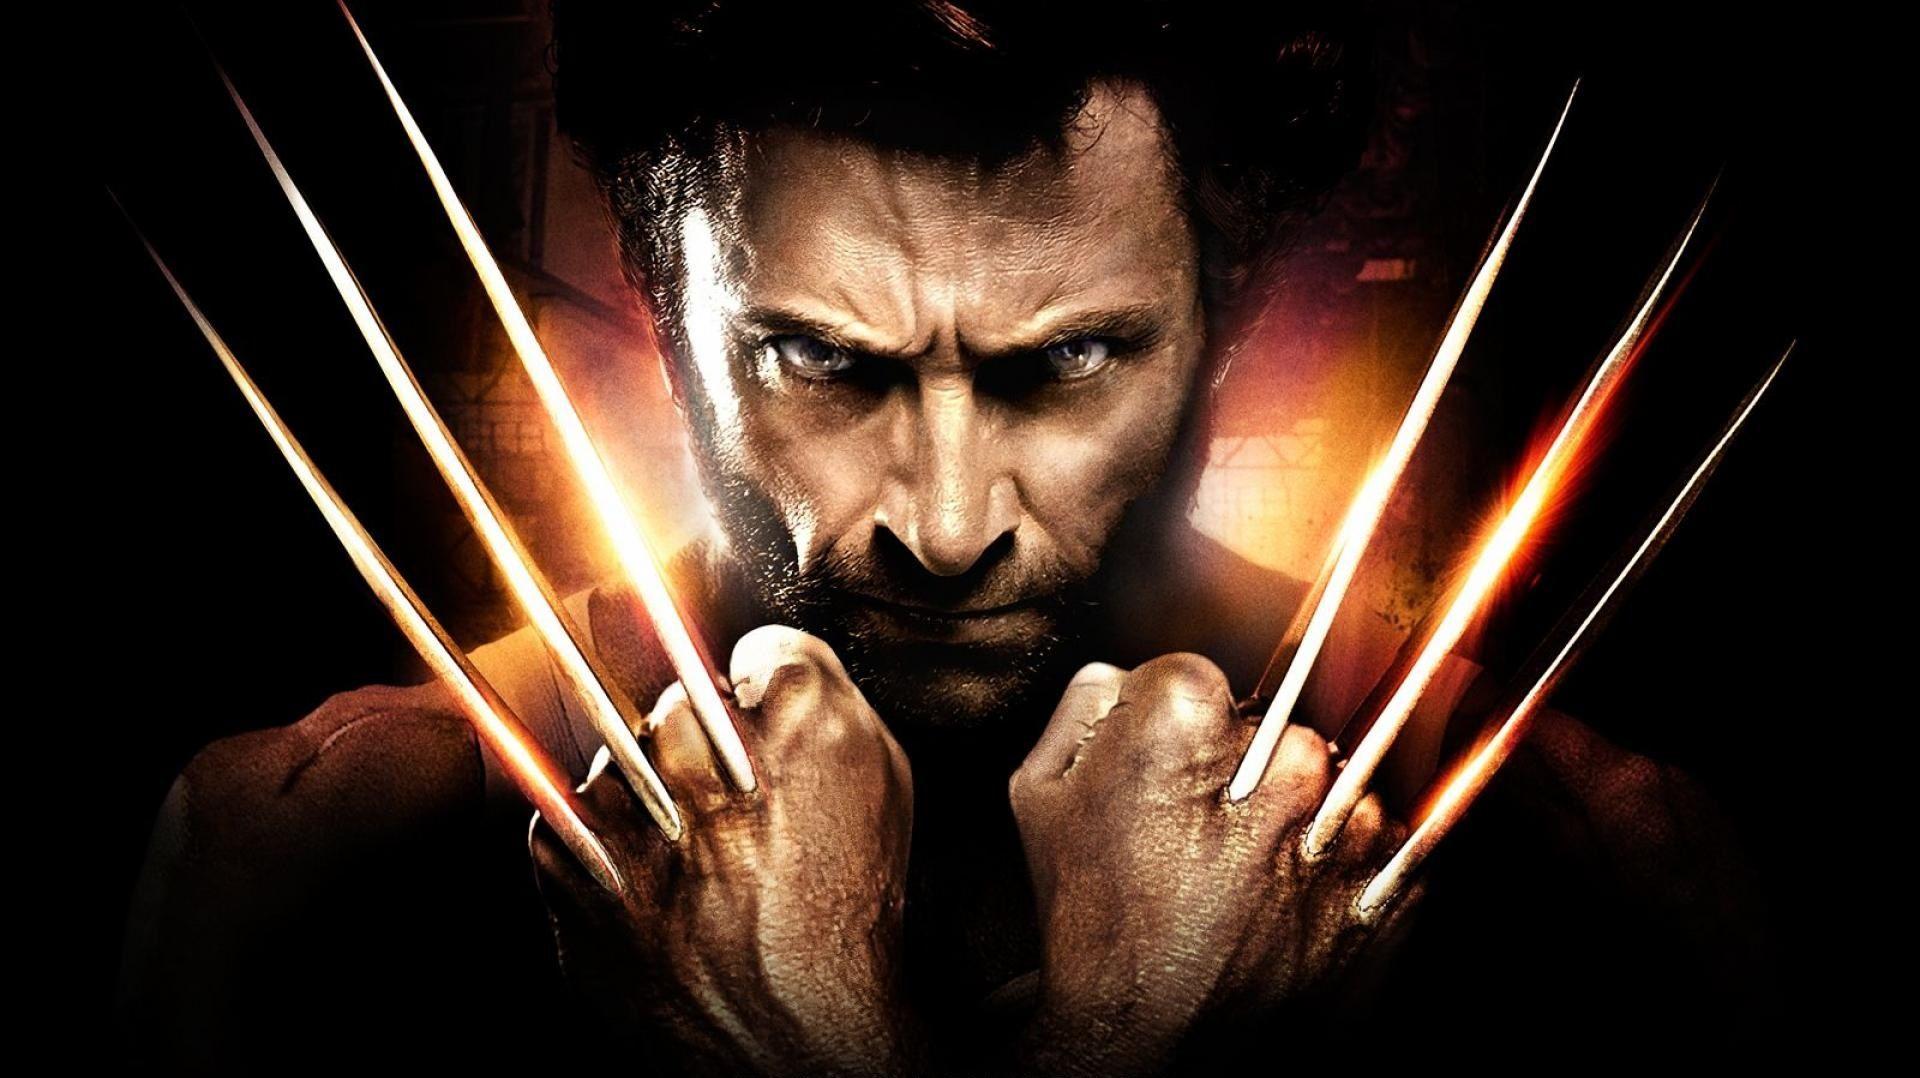 Wolverine S Best Movie Moments Wolverine Claws Wolverine Movie Wolverine